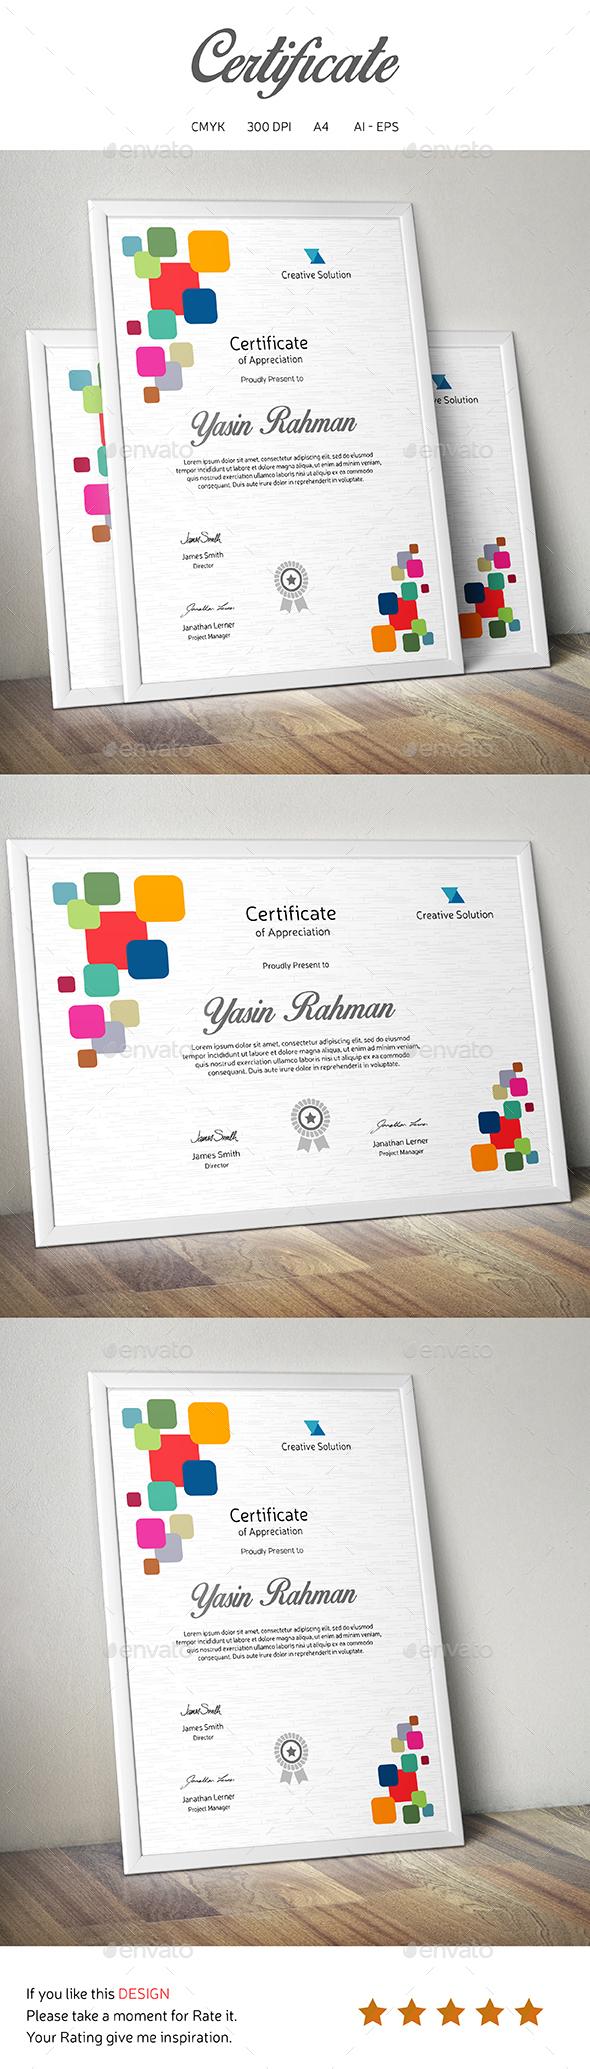 Certificate | Grafiken